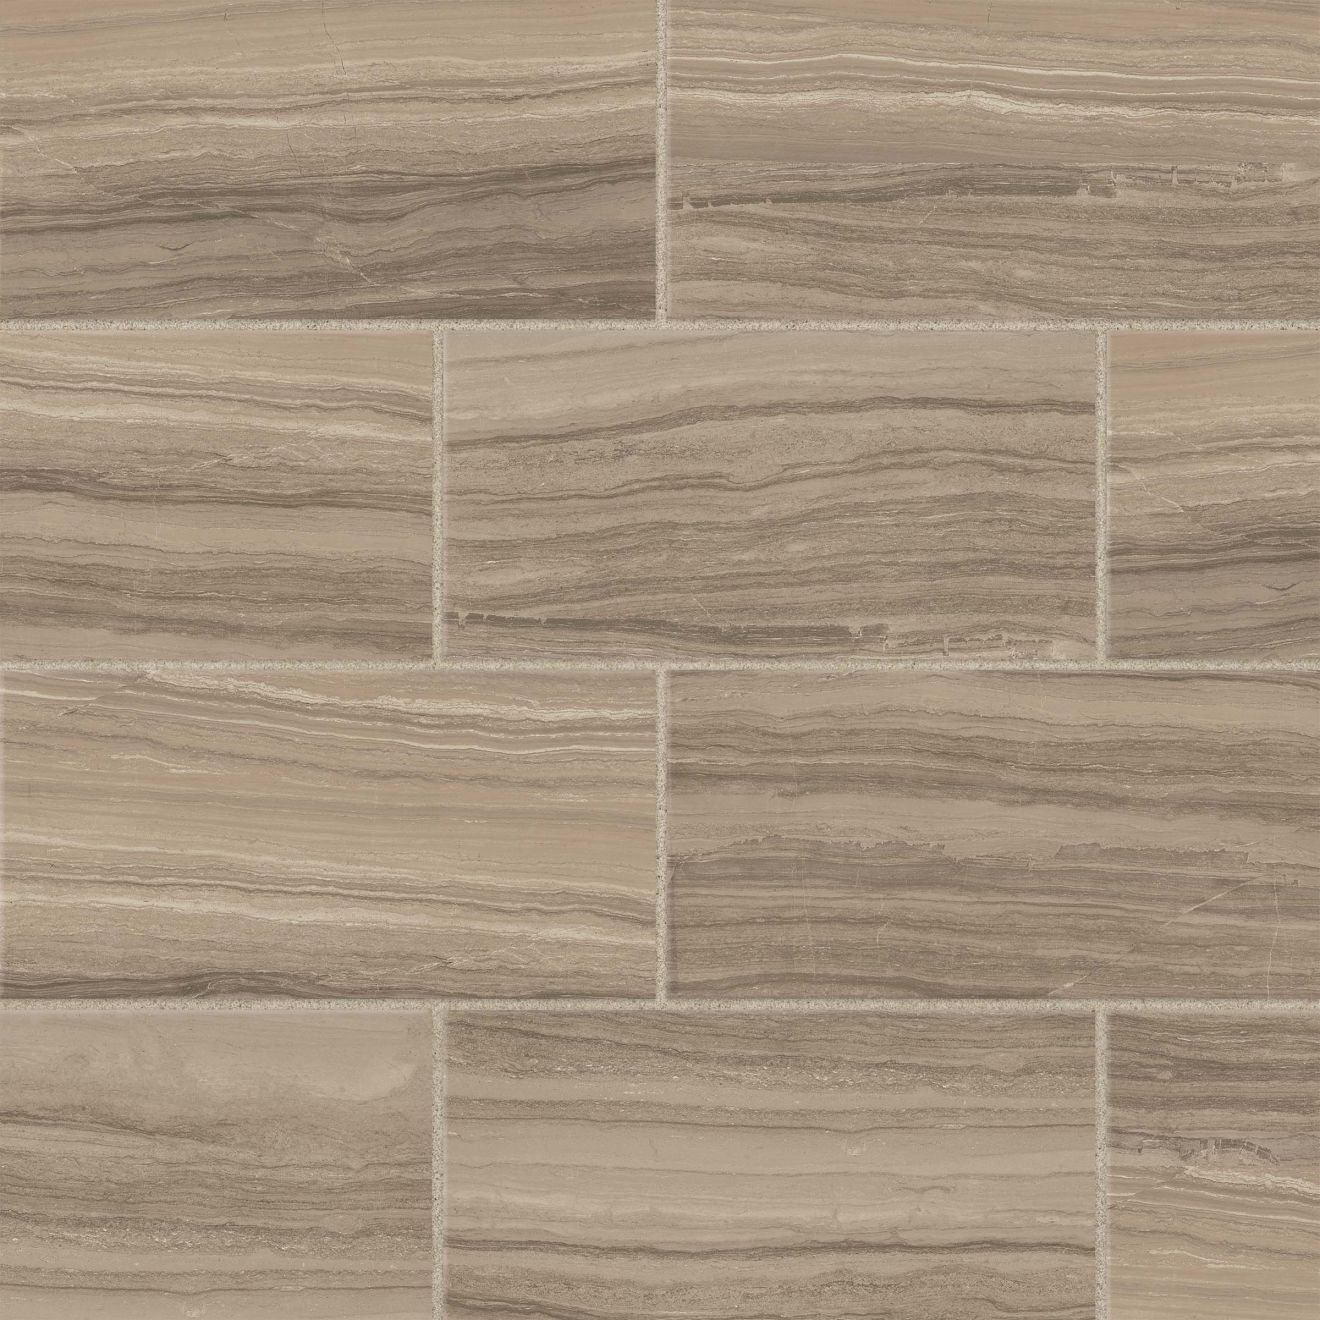 "Highland 12"" x 24"" Floor & Wall Tile in Beige"